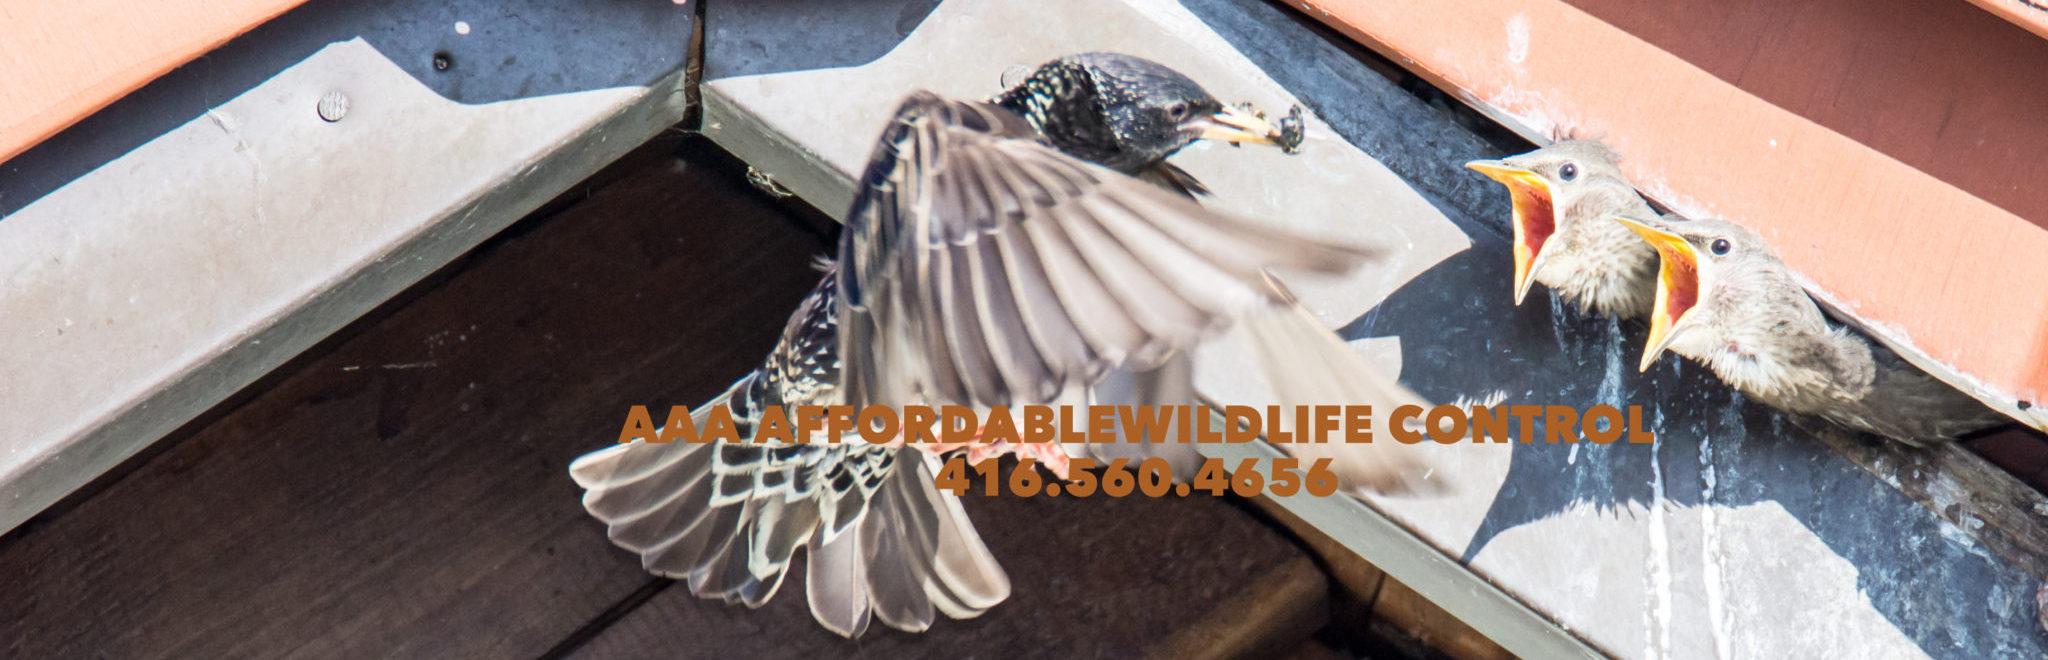 Bird Nest Removal Toronto – Bird Removal Toronto